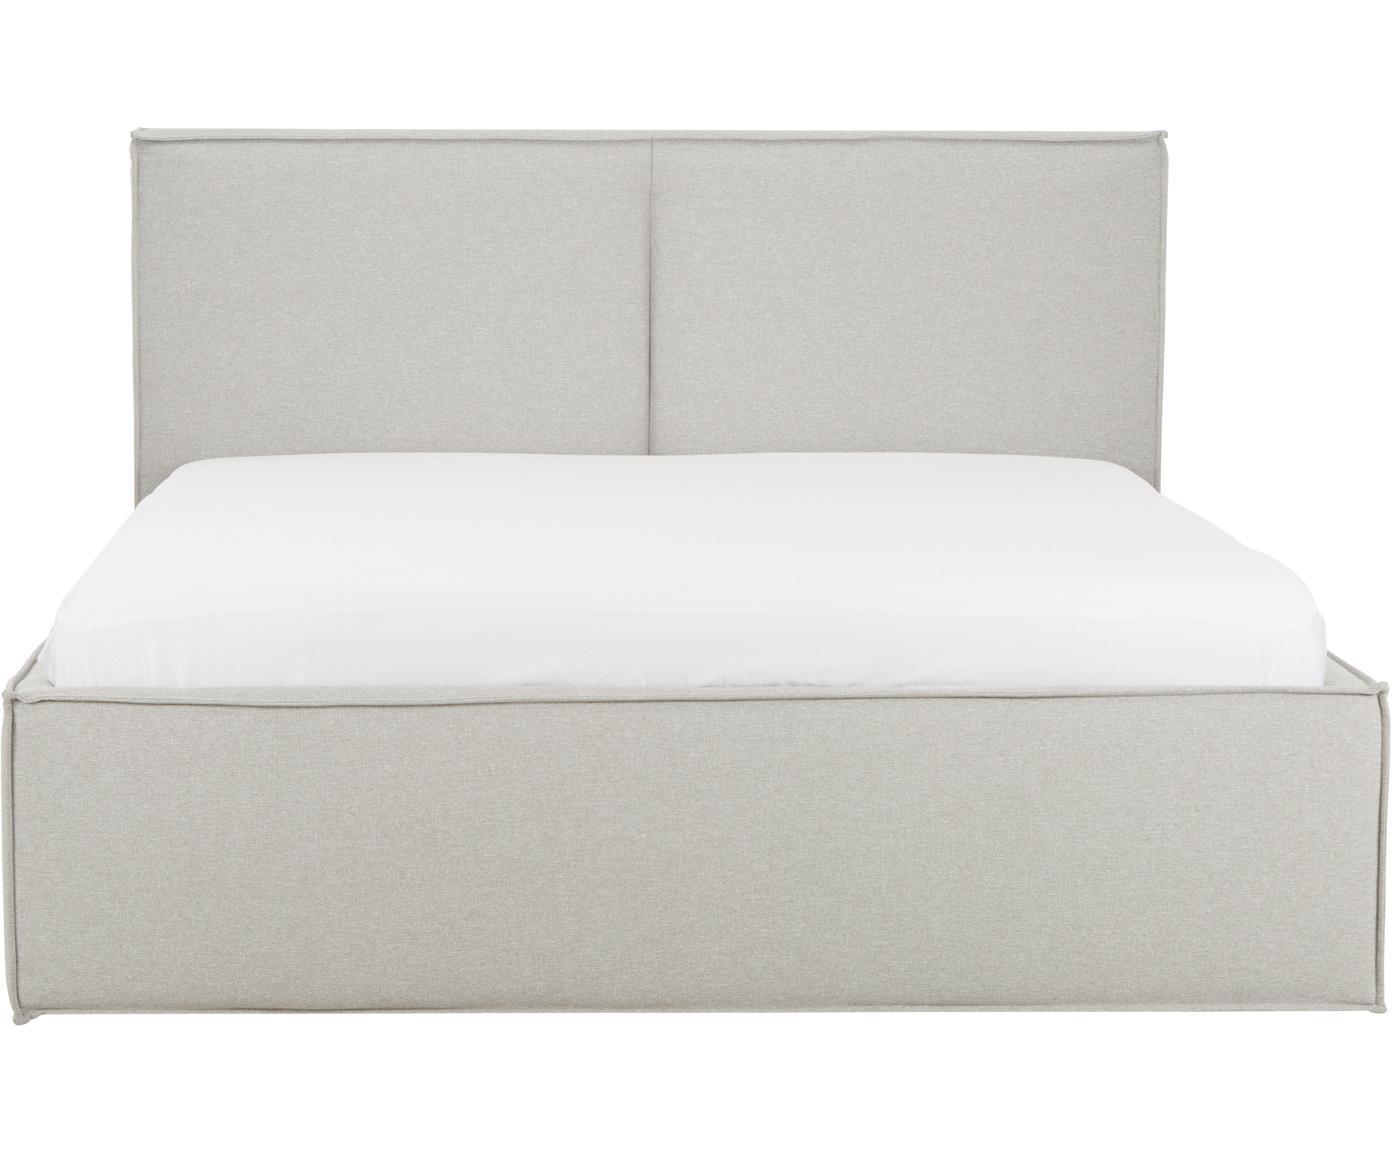 Polsterbett Dream mit Stauraum, Korpus: Massives Kiefernholz, Bezug: Polyester (Strukturstoff), Webstoff Hellgrau, 180 x 200 cm